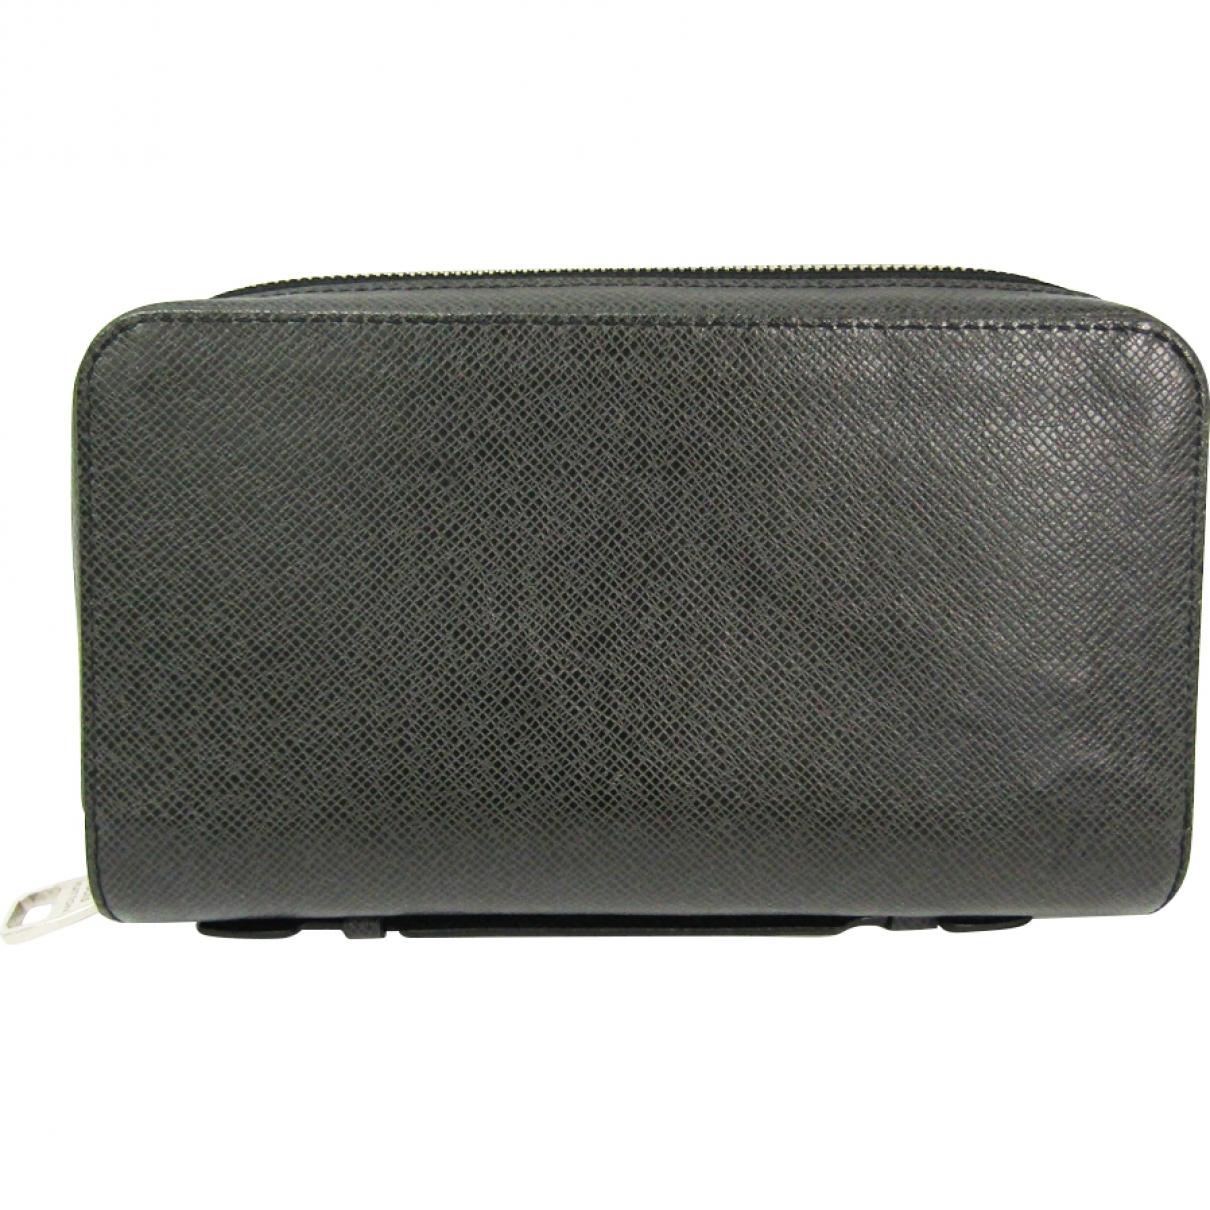 Louis Vuitton Zippy XL Black Cloth Small bag, wallet & cases for Men \N